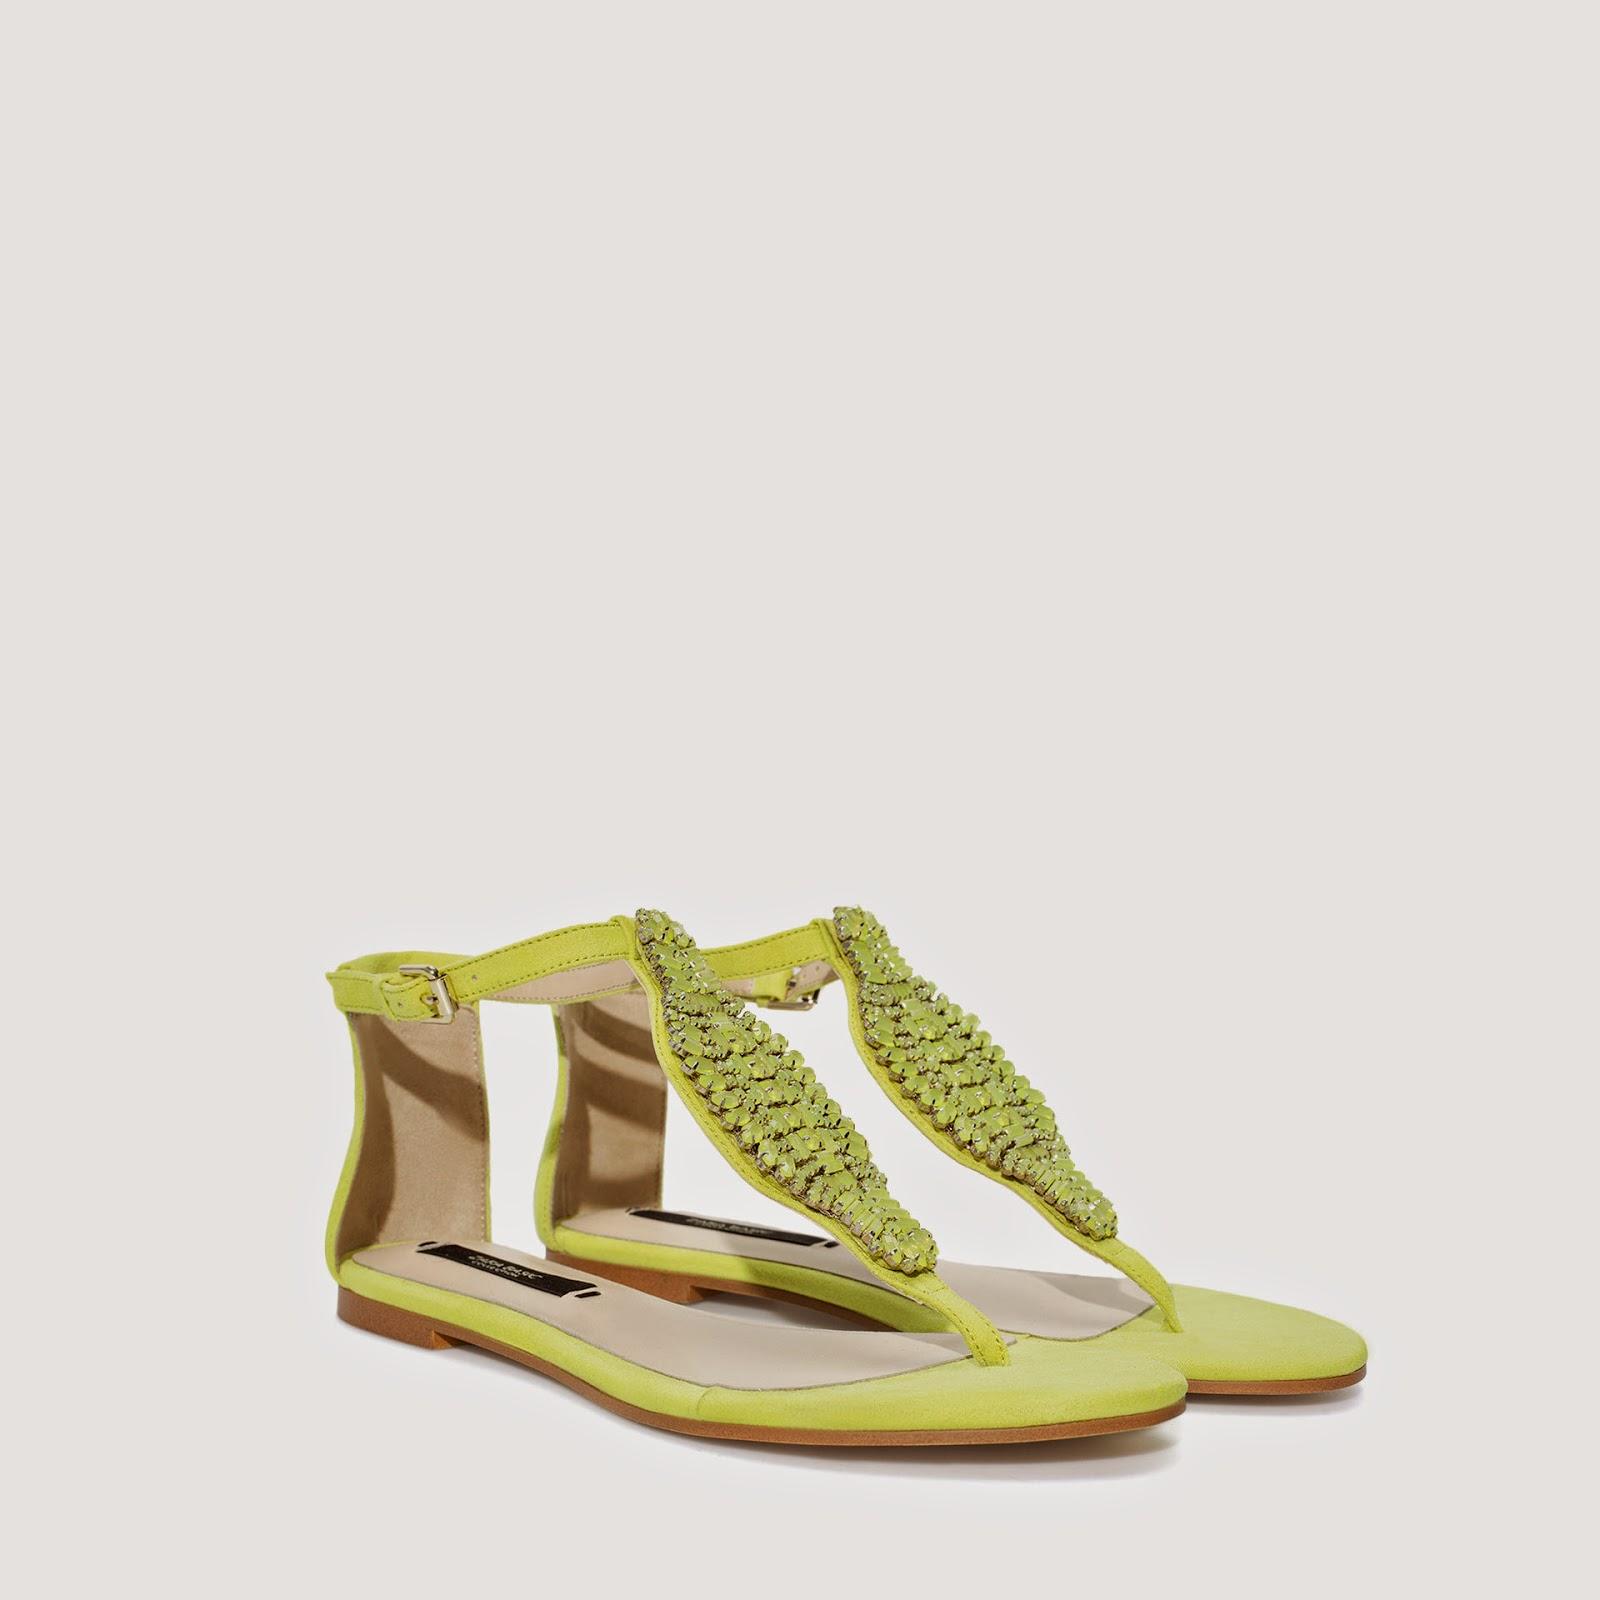 Sandalias Mujer/Sandals Woman: ZARA